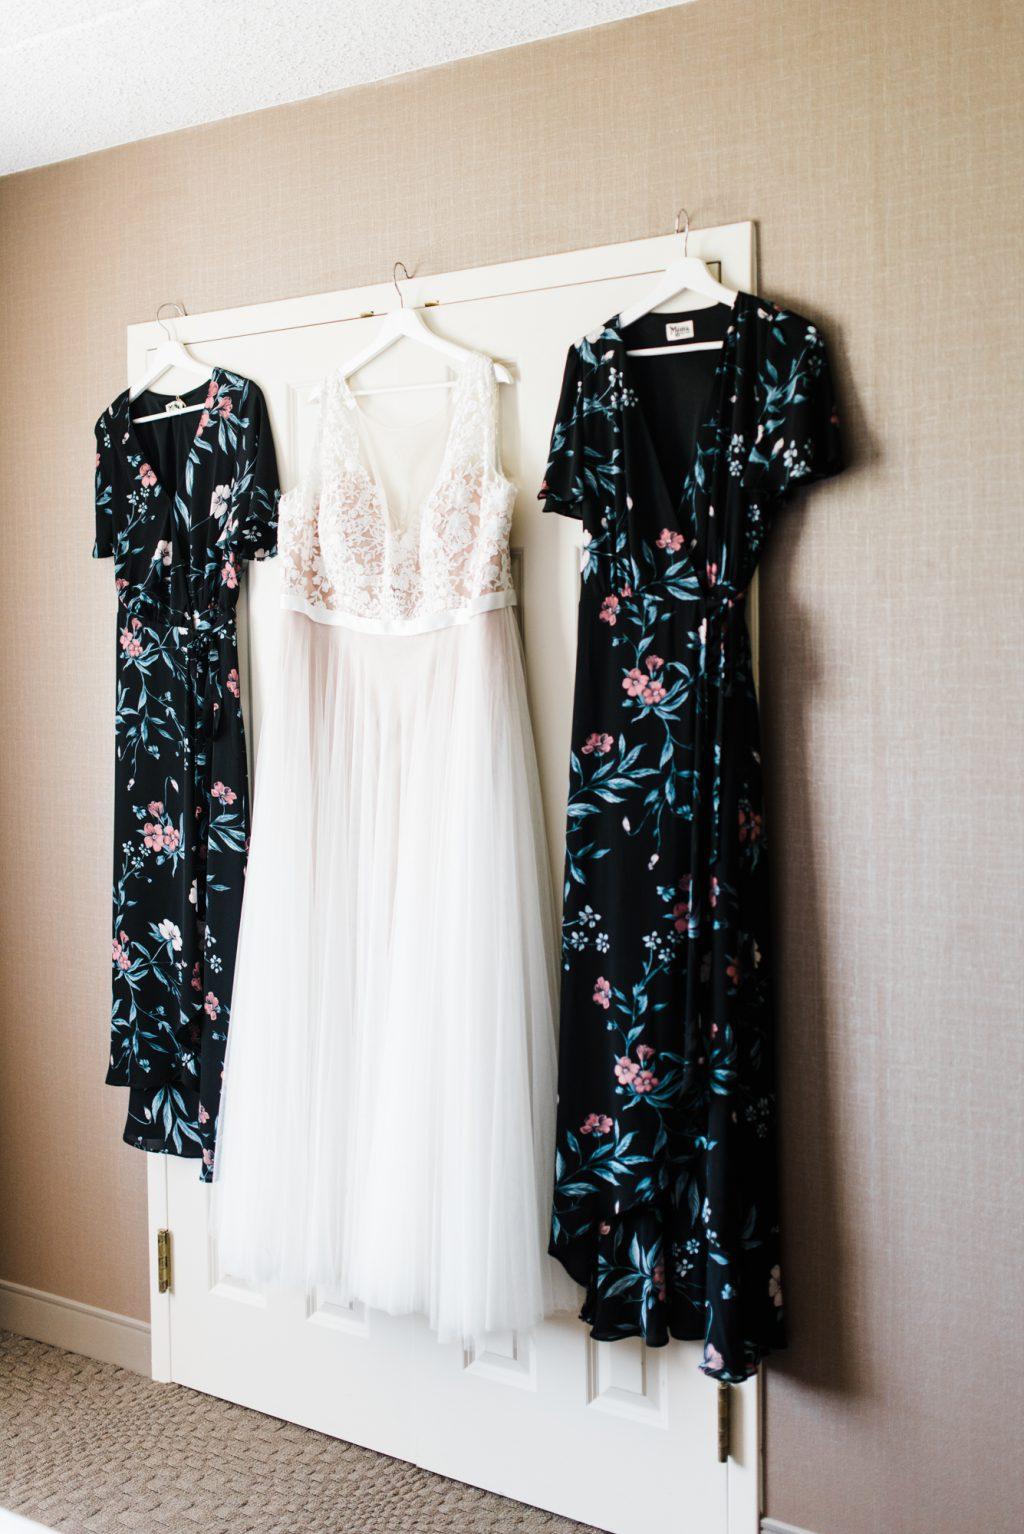 haley-richter-photo-west-chester-summer-wedding-boxcar-brewery-010